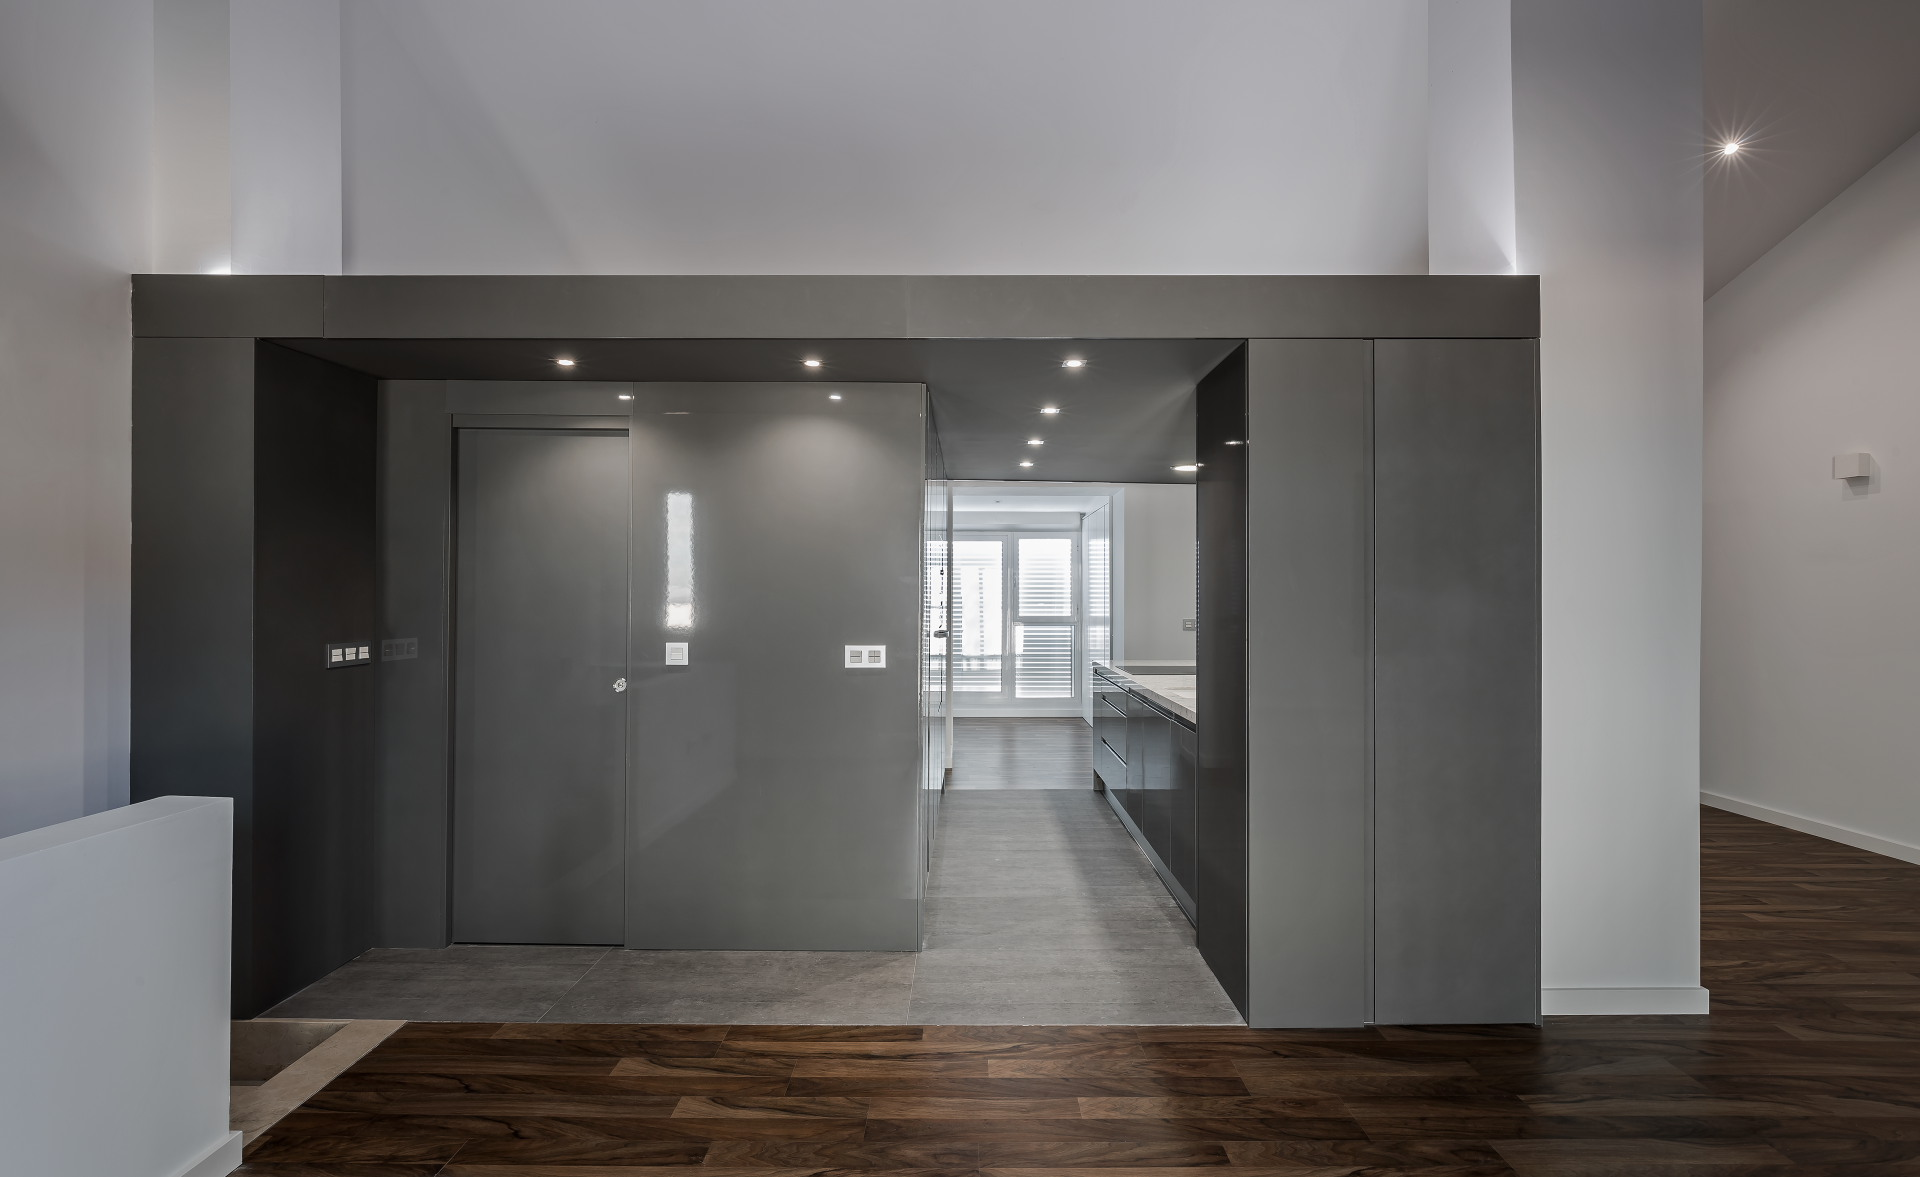 fotografia-arquitectura-valencia-german-cabo-viraje-reforma-campanar (5)